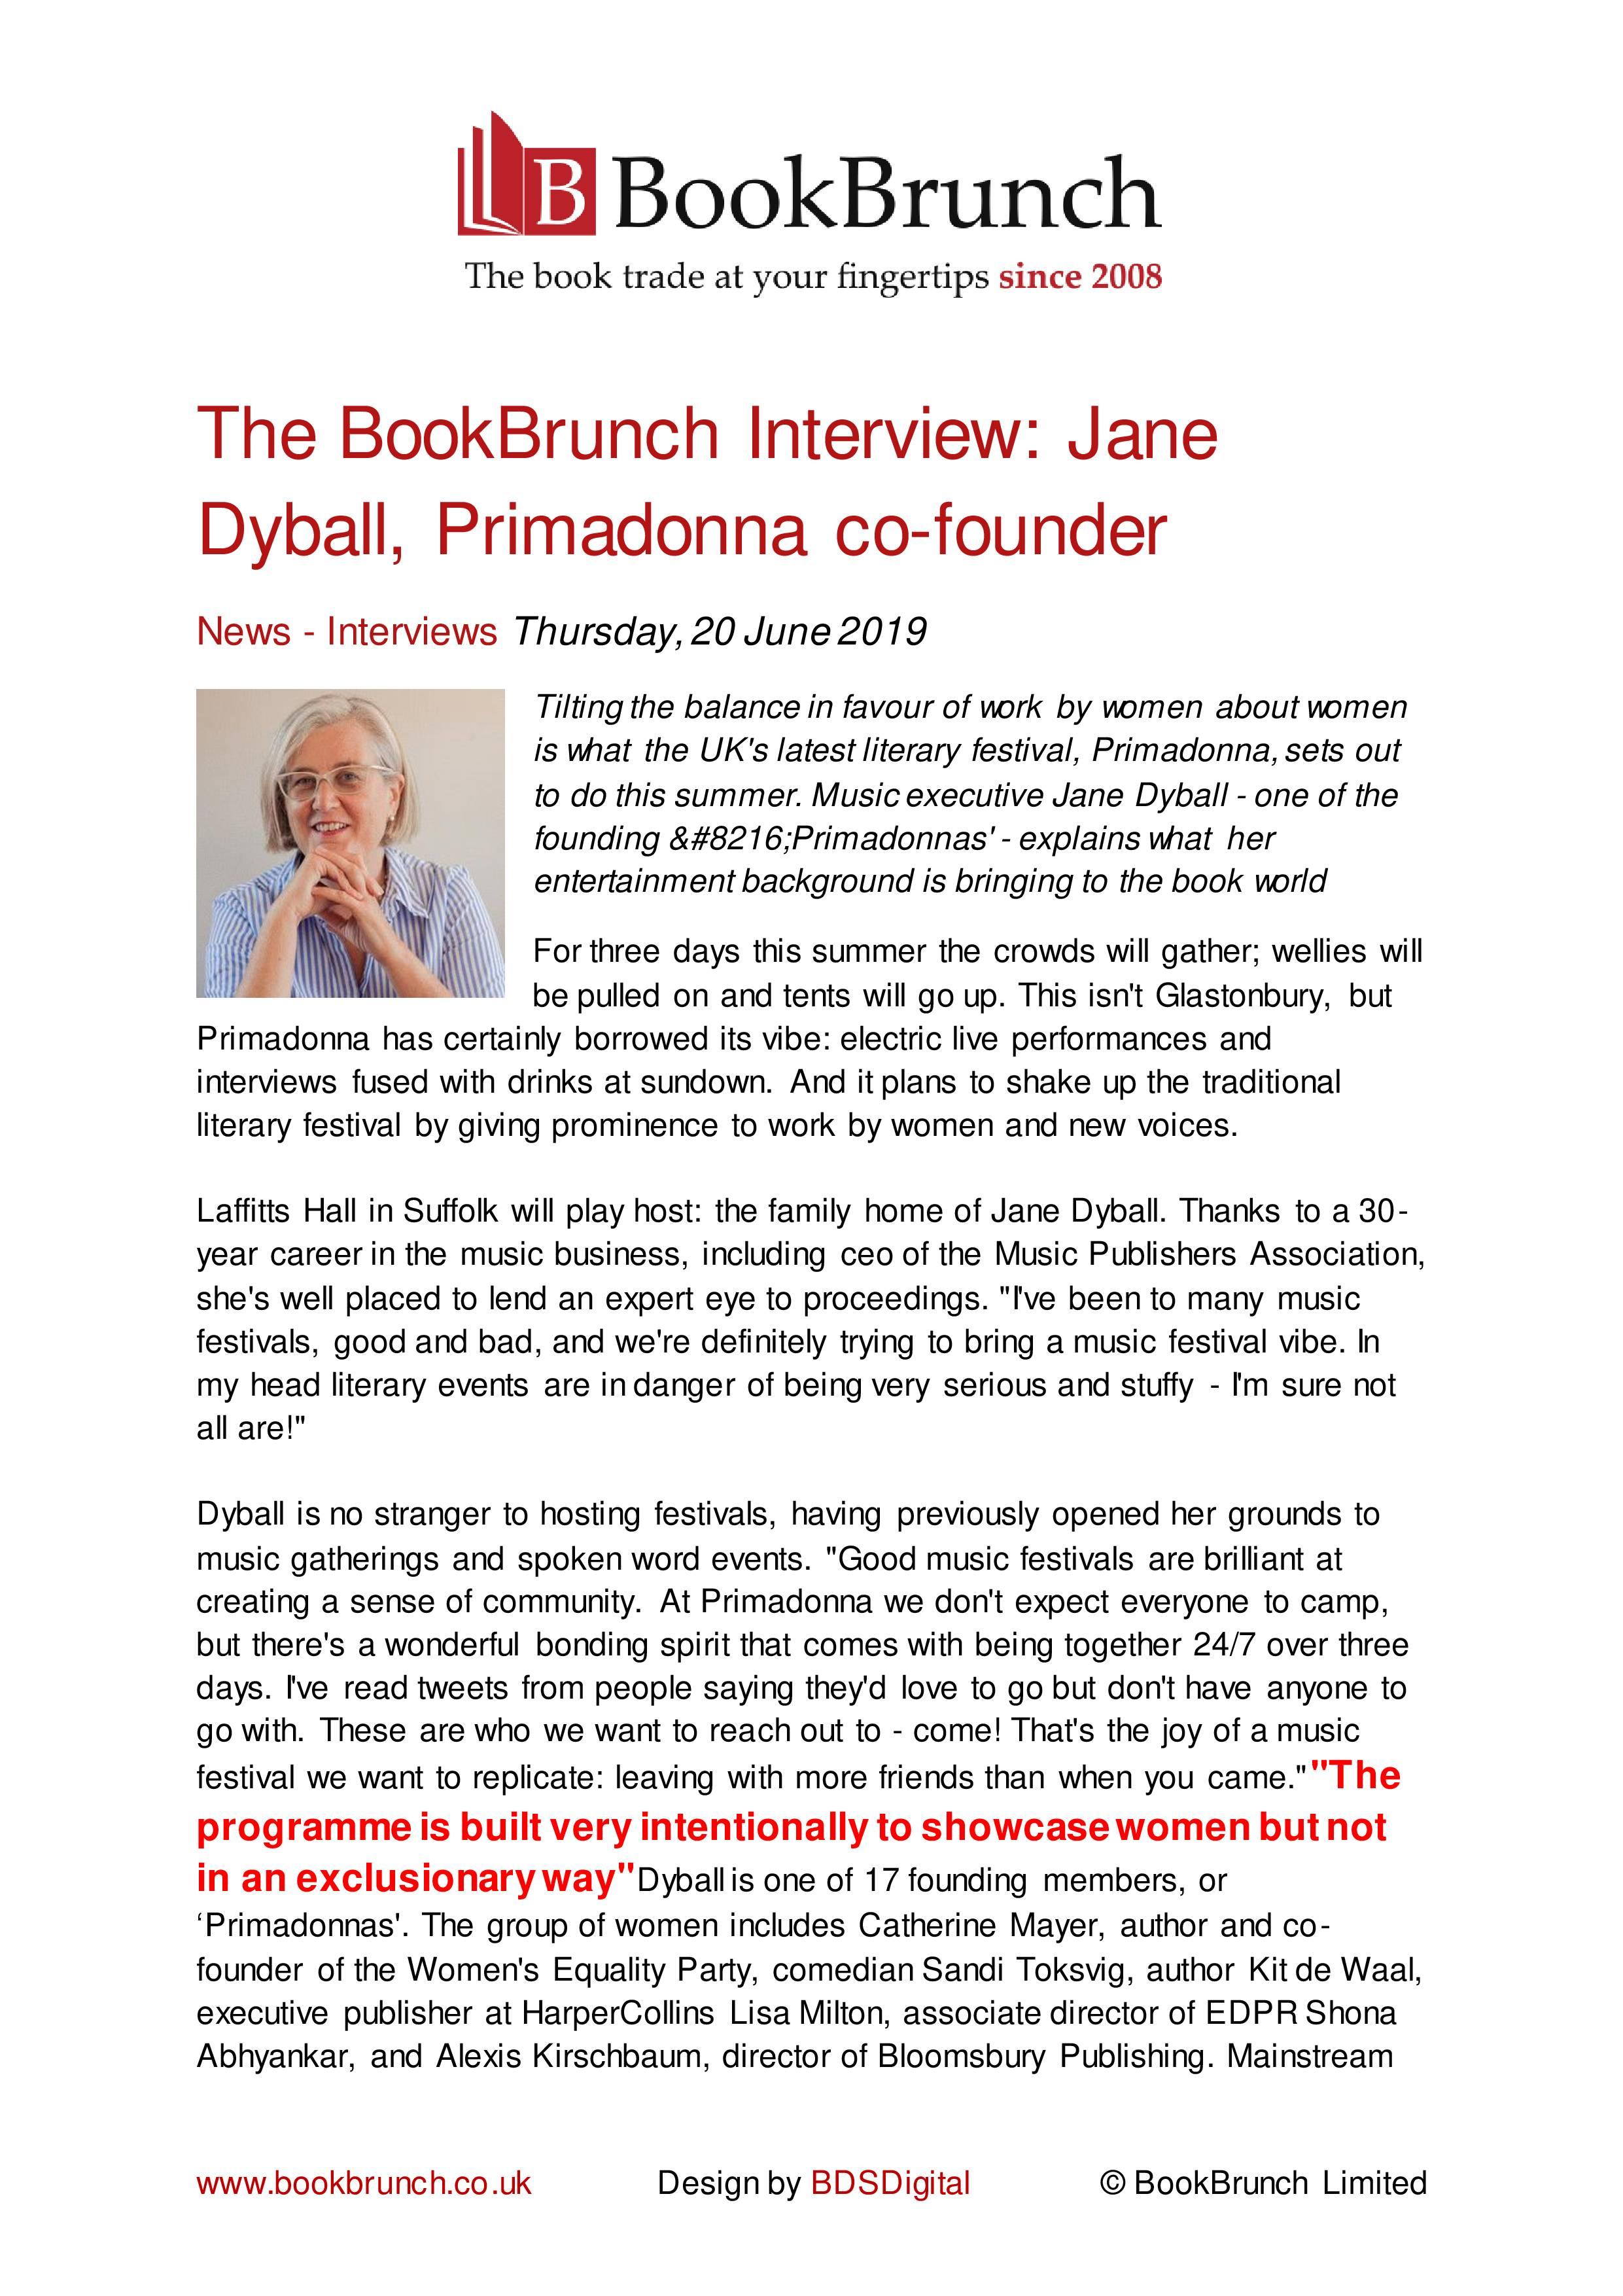 BookBrunch PDF Export - The BookBrunch Interview_ Jane Dyball, Primadonna co-founder (1)-1.jpg